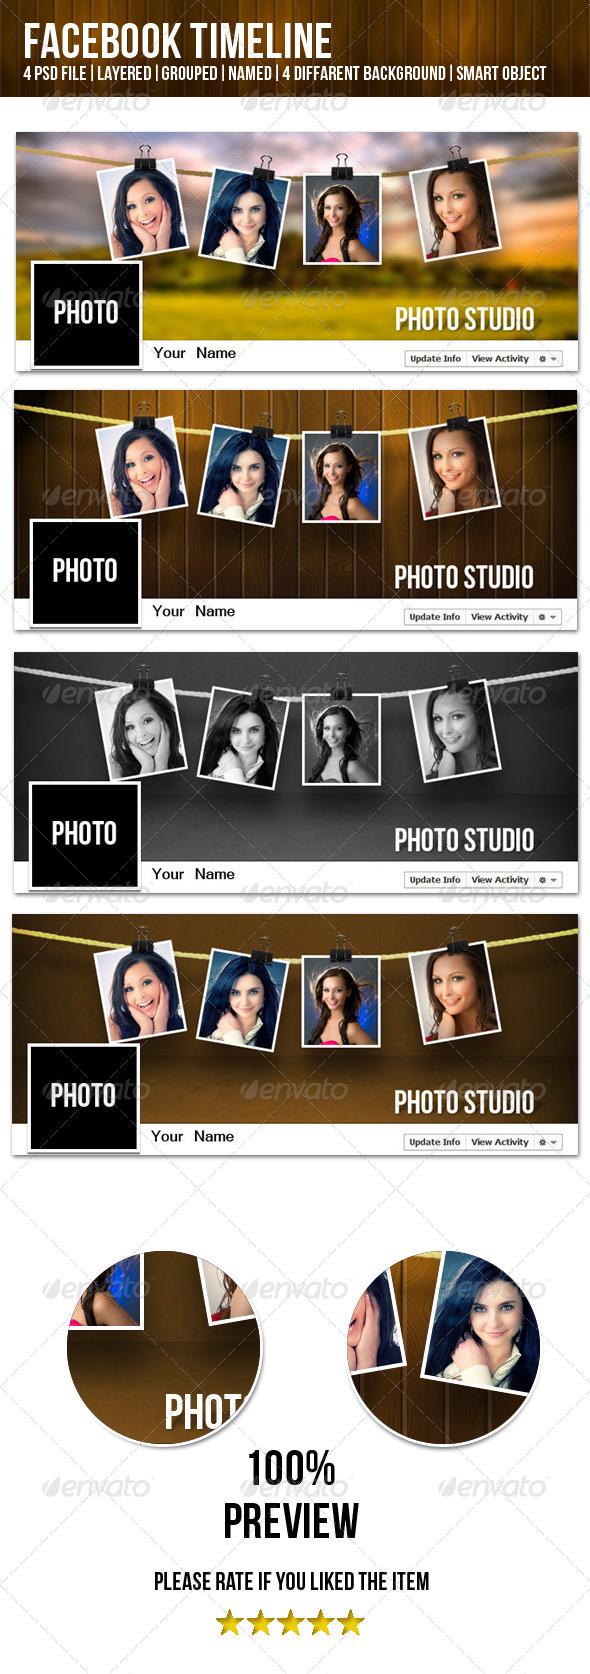 GraphicRiver Facebook Timeline Photo Studio 4442948